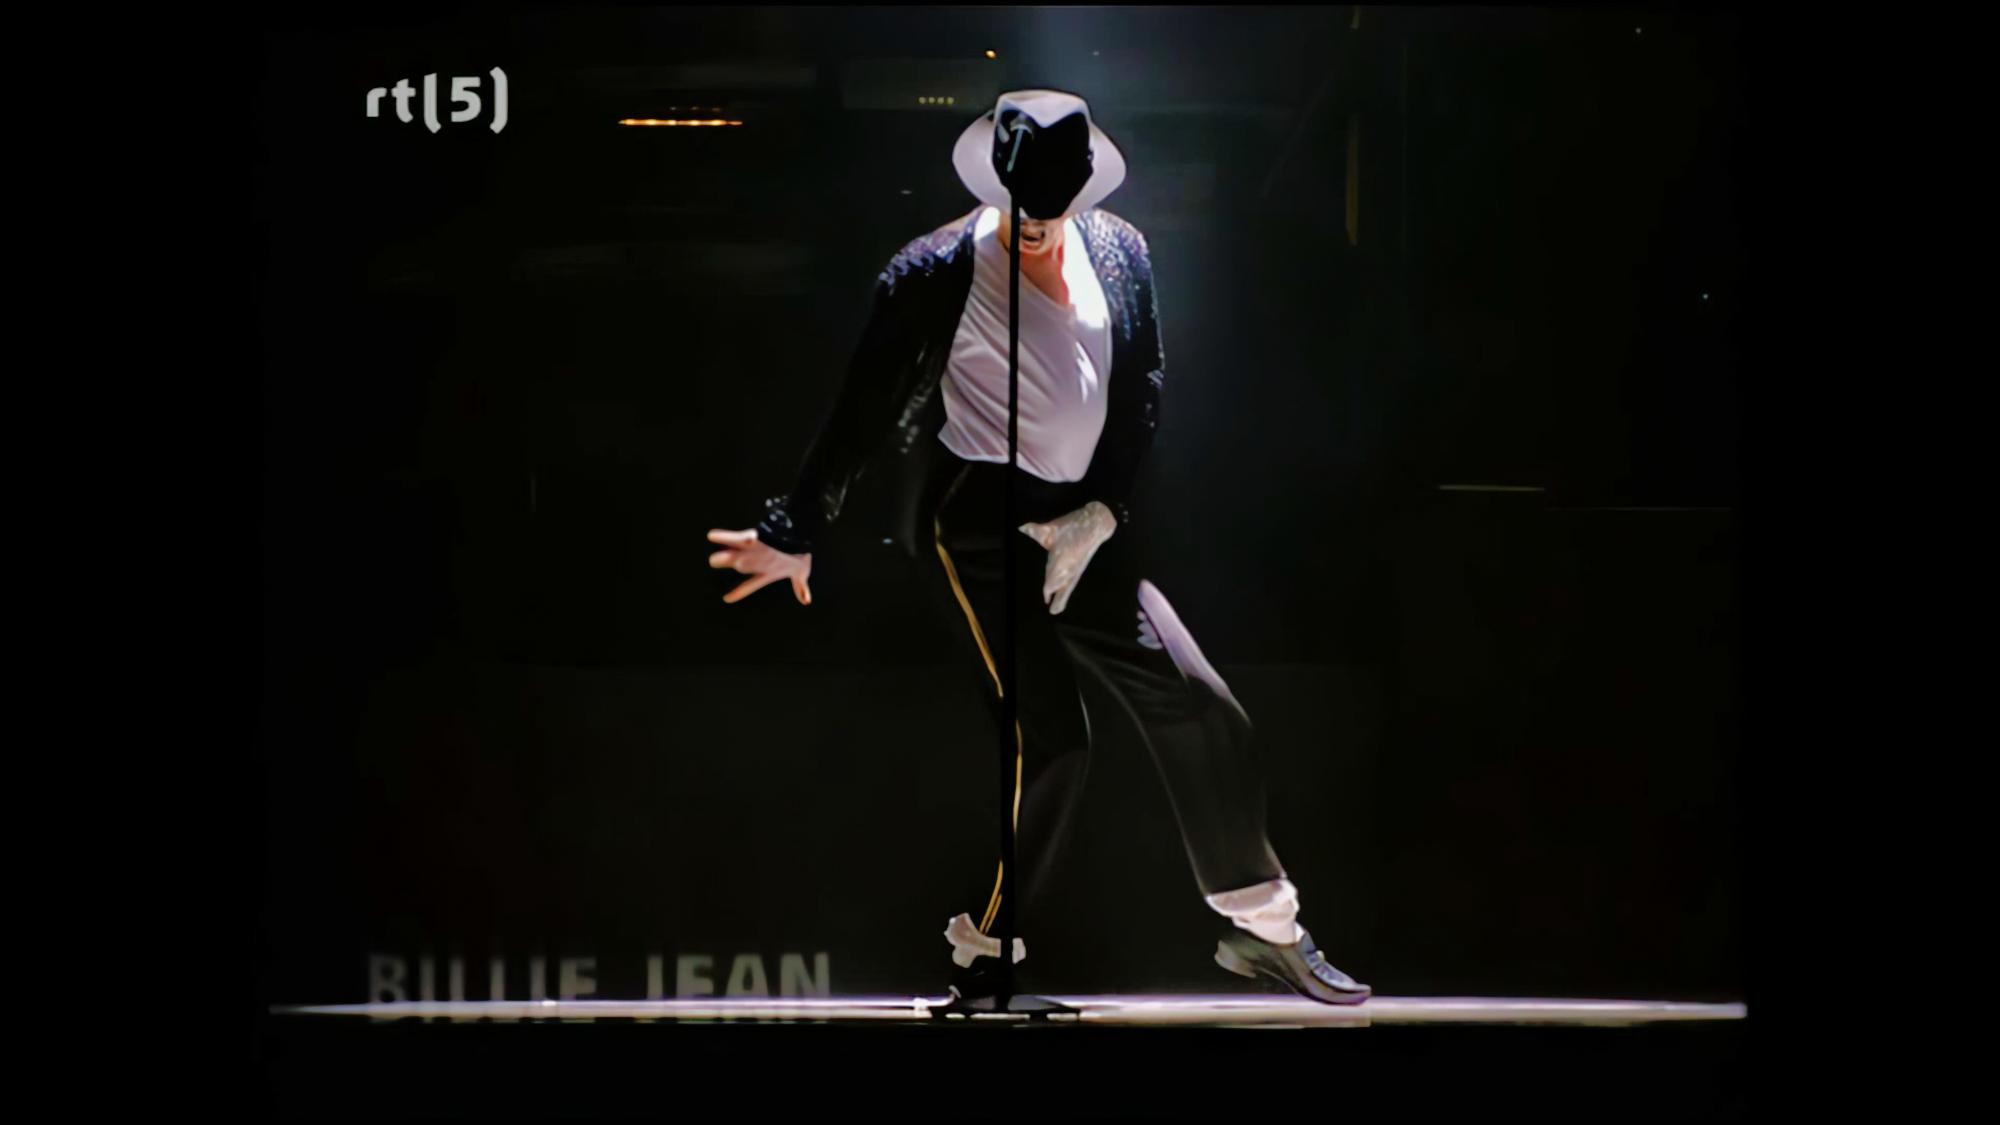 【1080p修复60帧】Michael Jackson1997德国慕尼黑历史演唱会【收藏级画质】